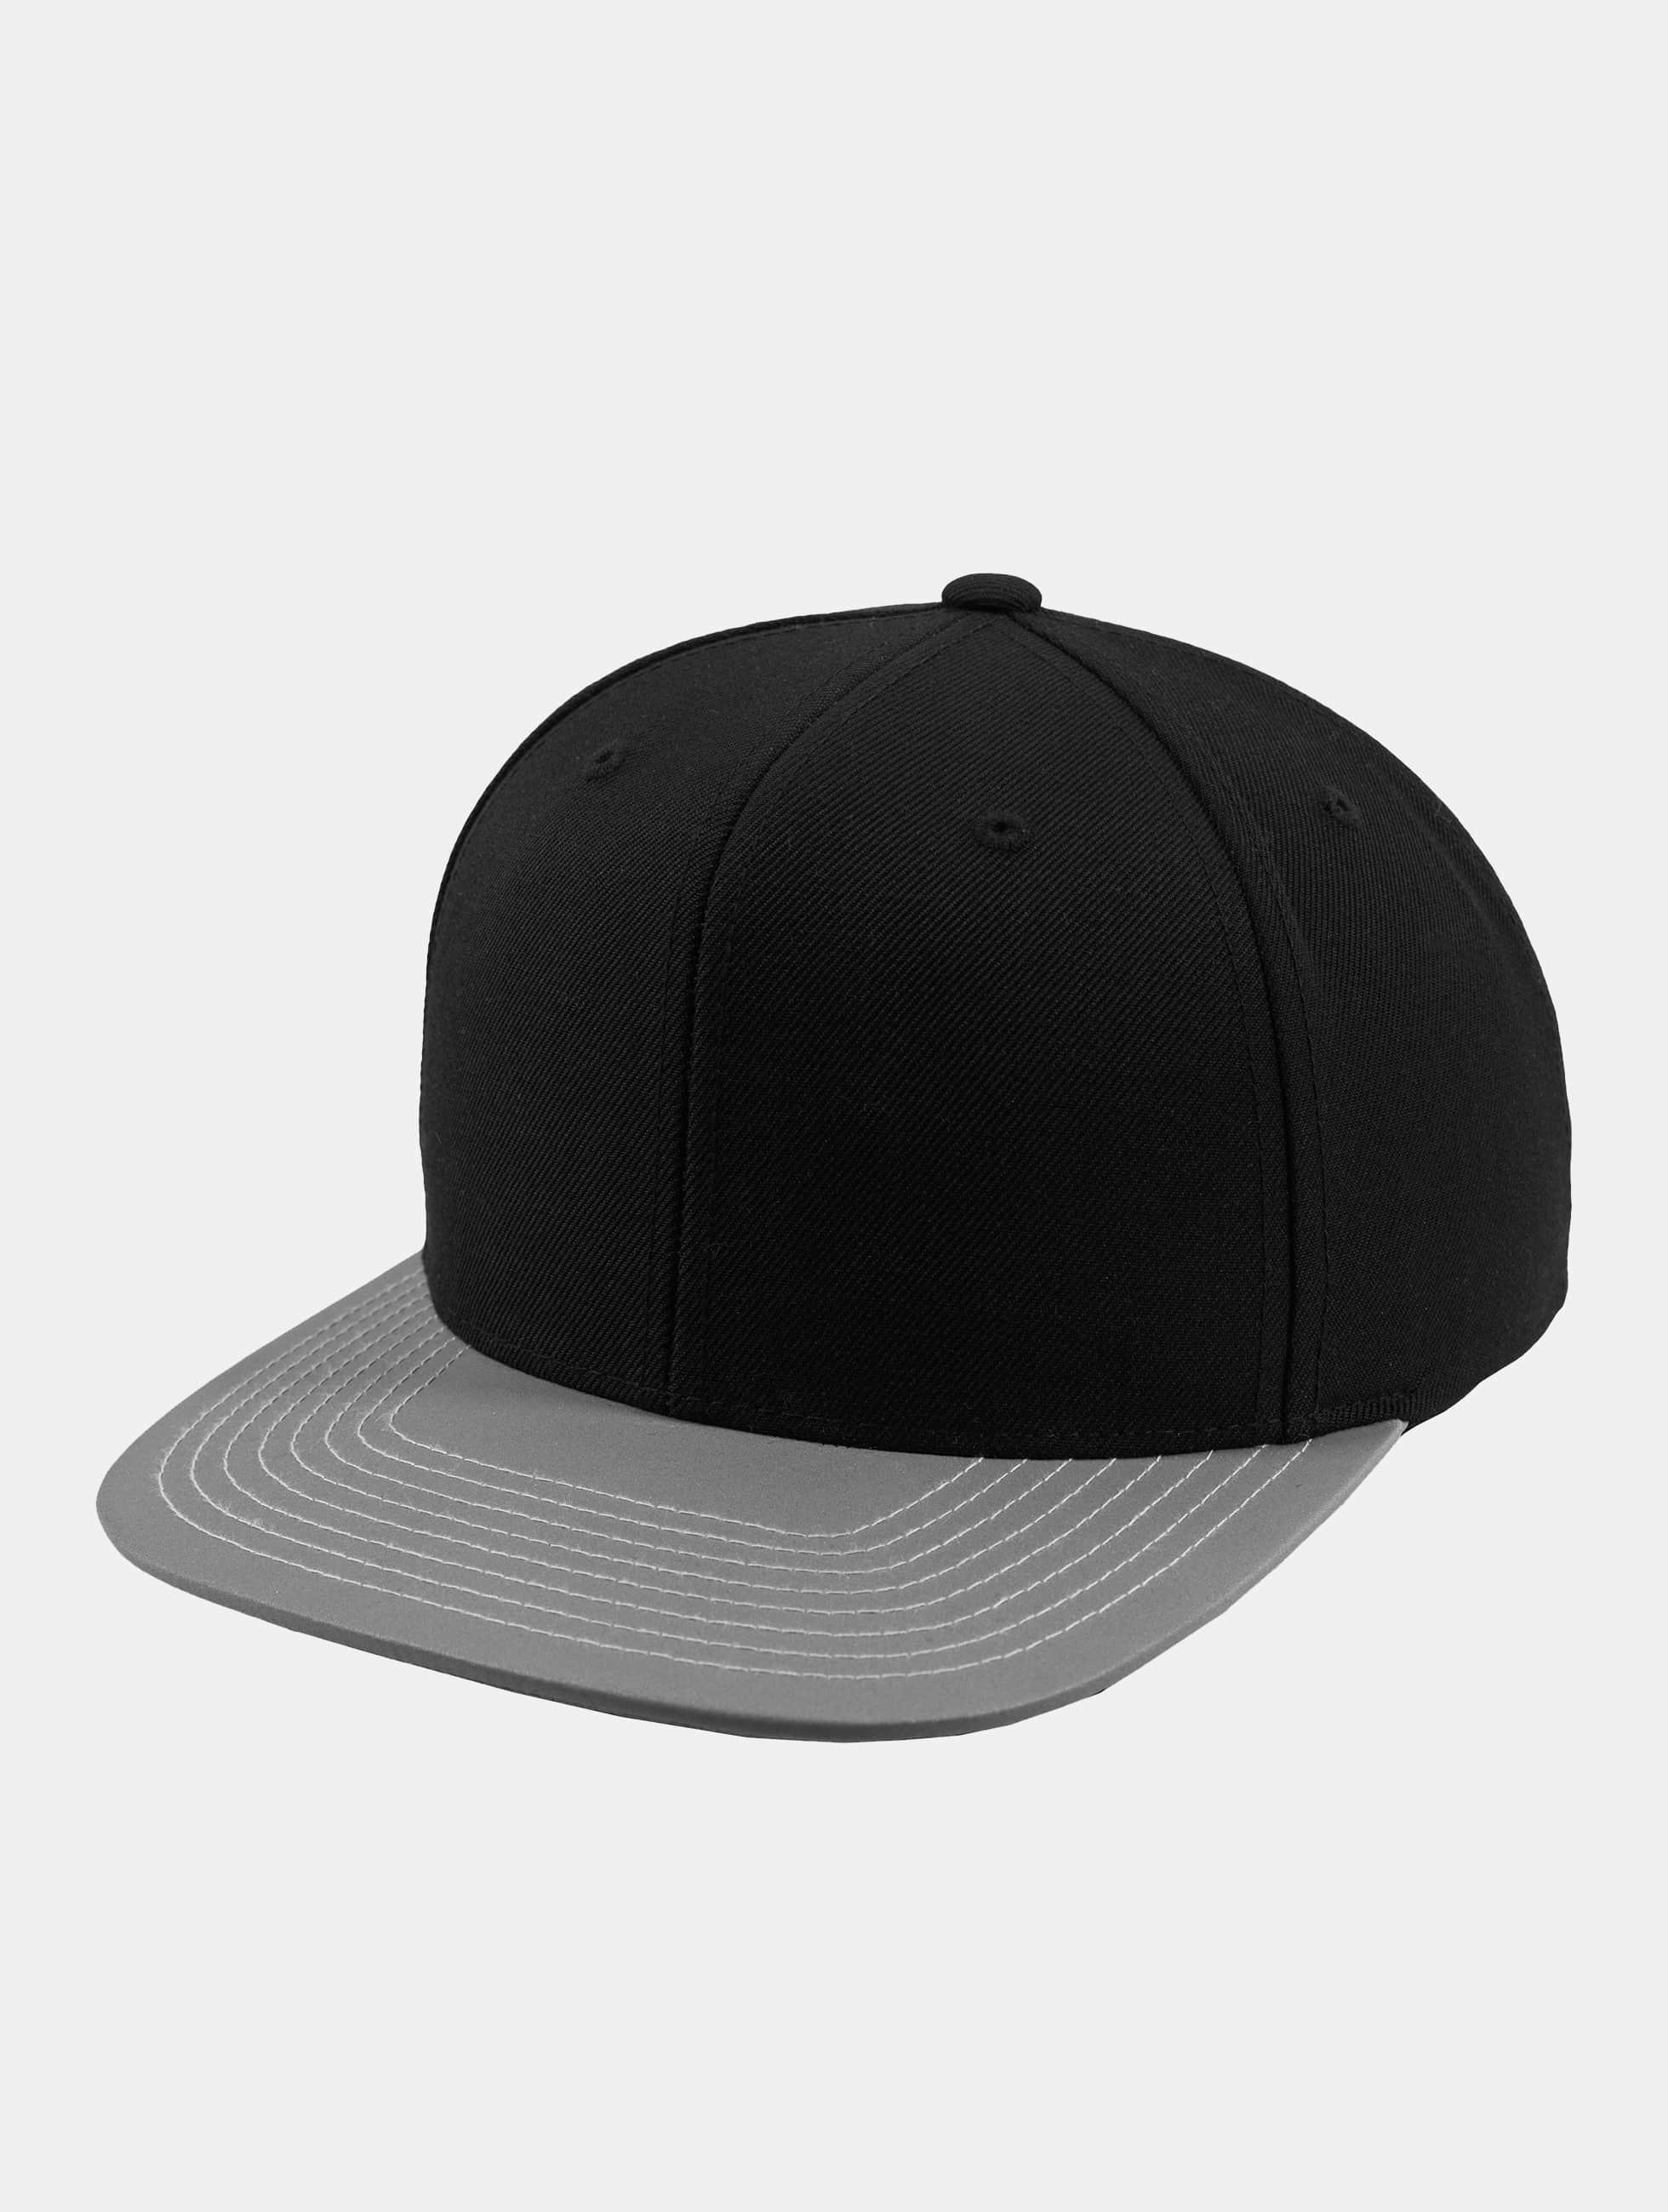 Flexfit Männer,Frauen Snapback Cap Reflective Visor in schwarz